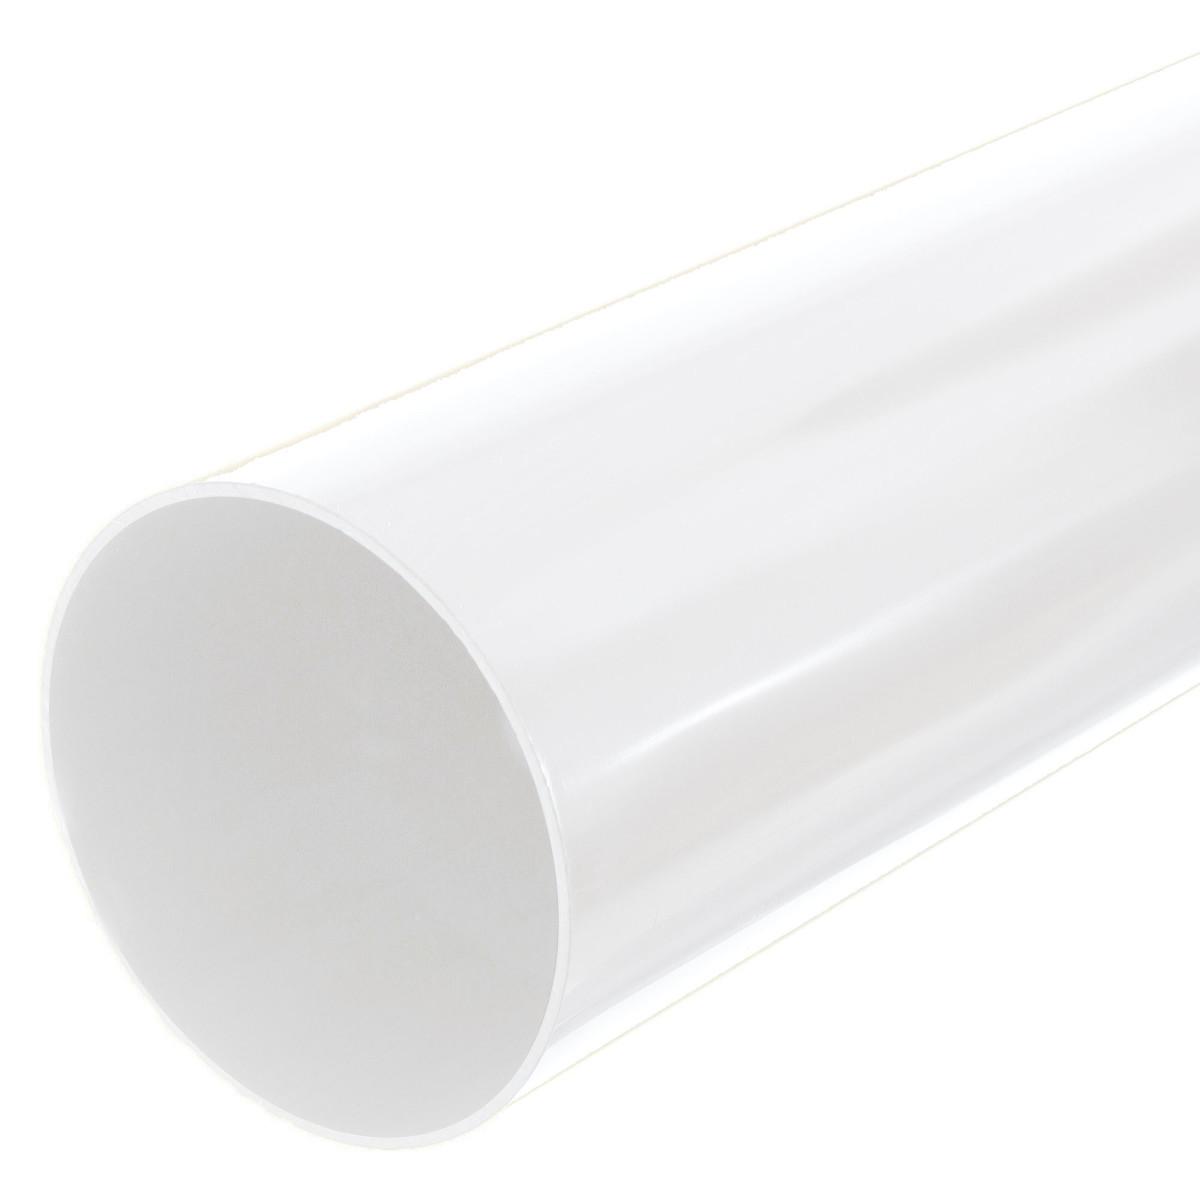 Труба водосточная Dacha 80 мм 3 м белый